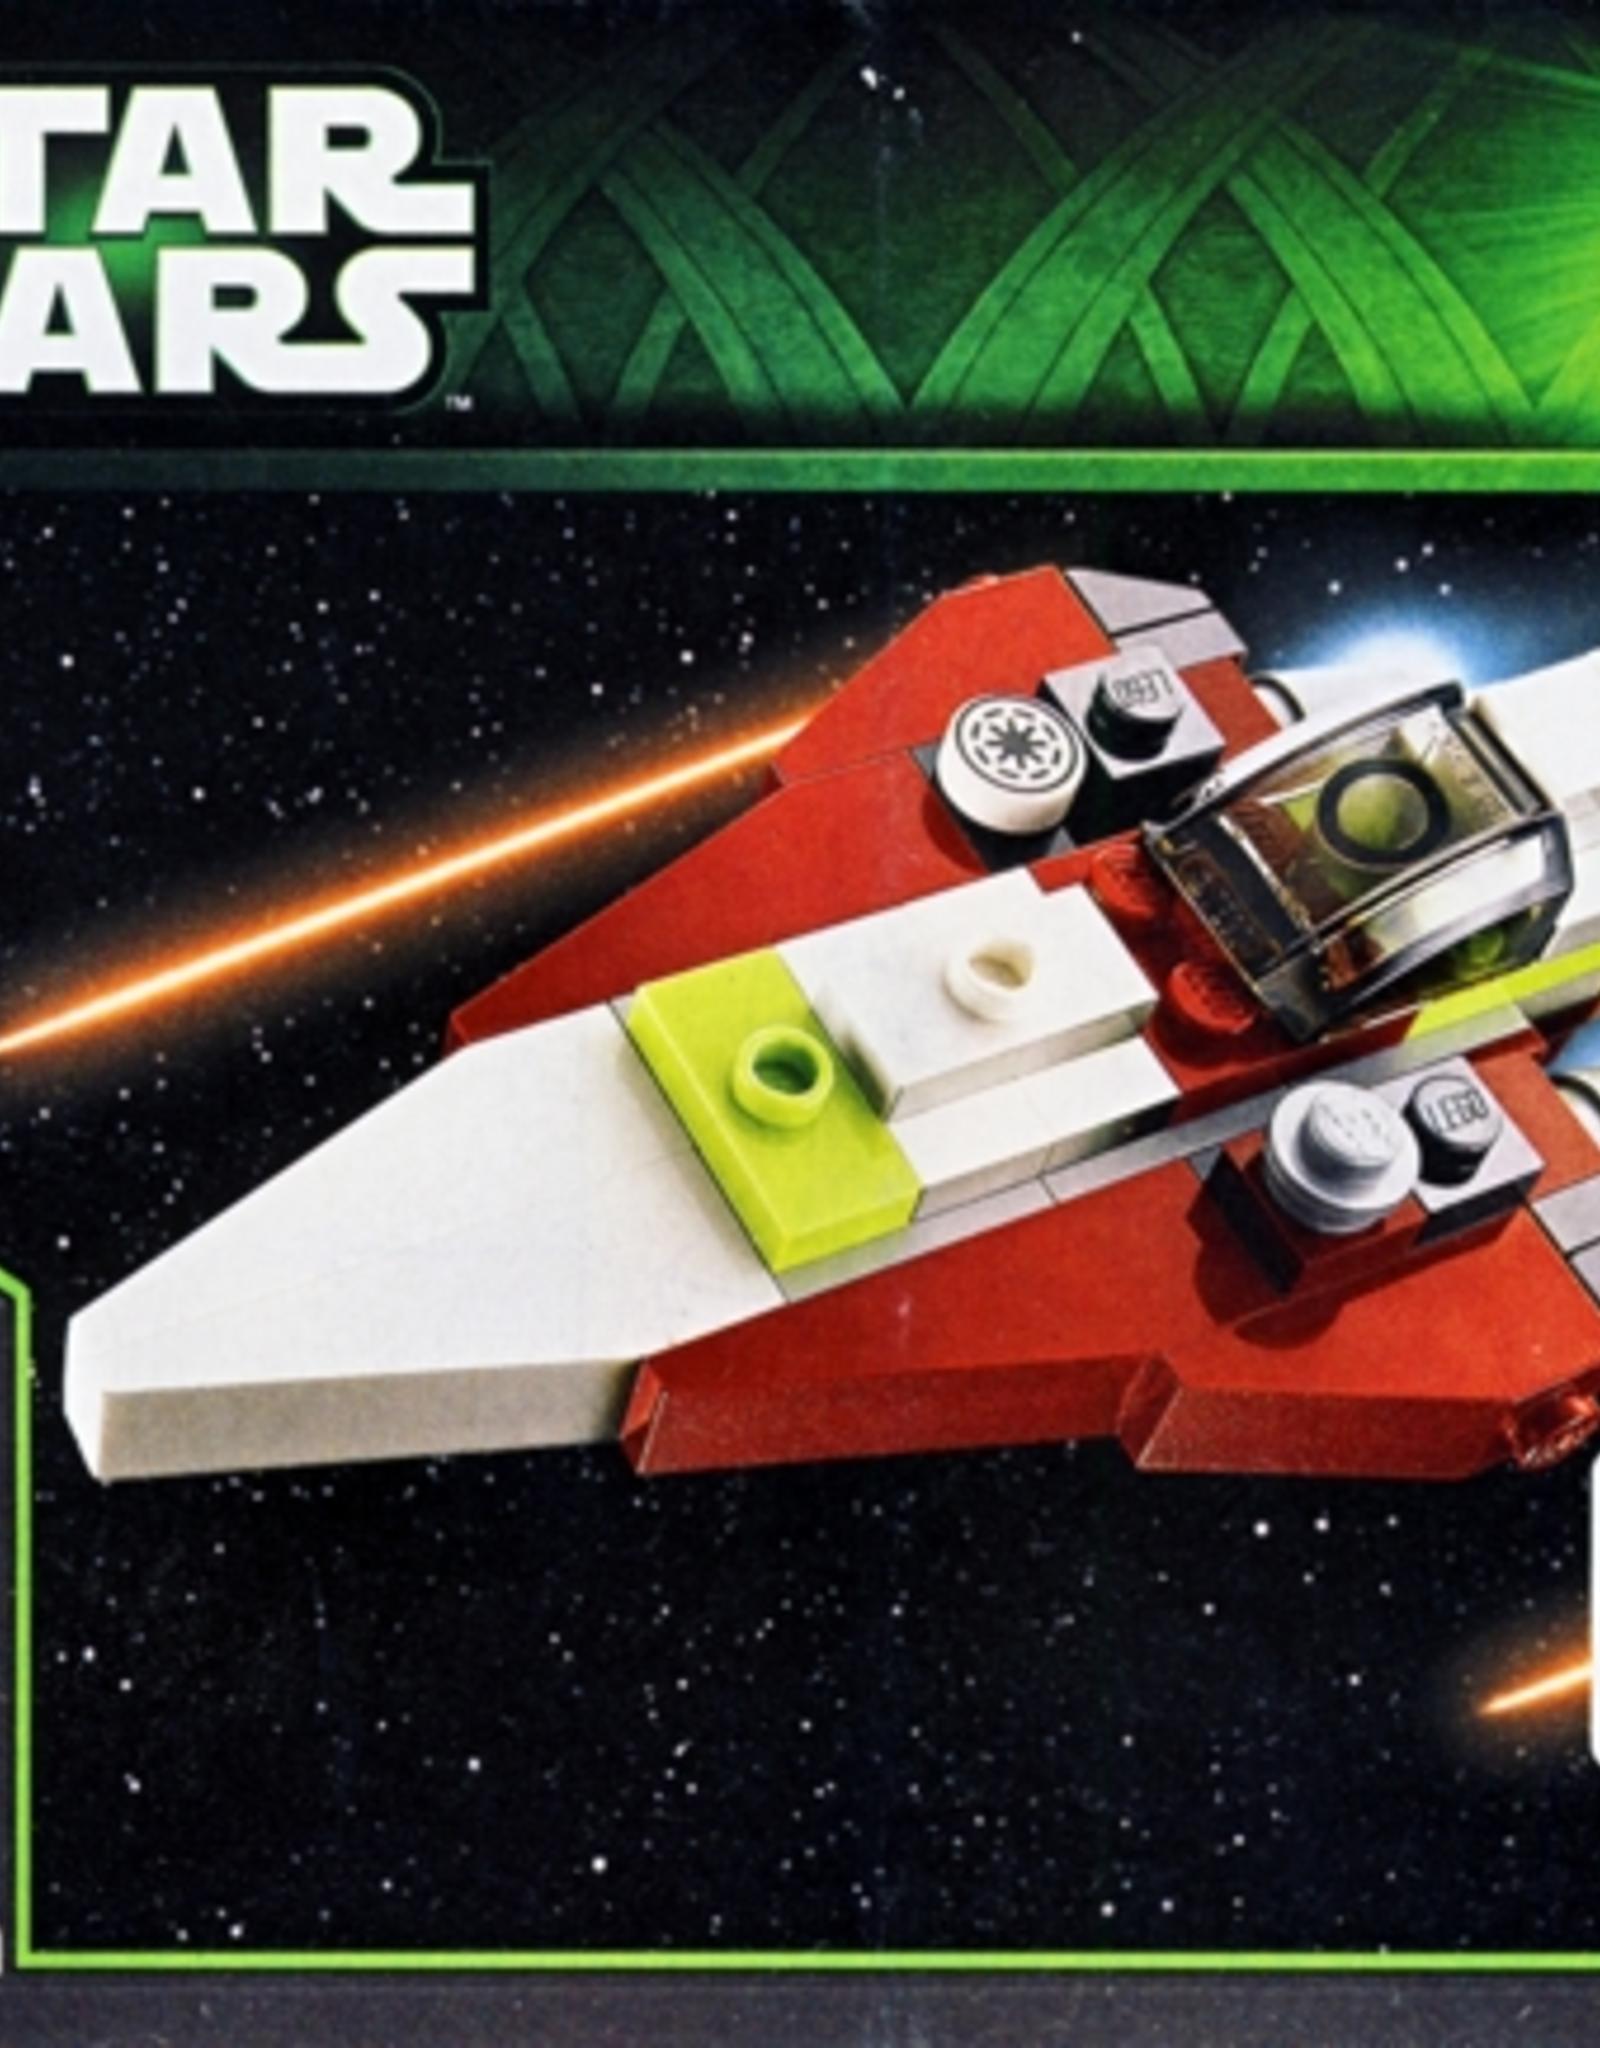 LEGO LEGO 75006 Jedi Starfighter & Planet Kamino STAR WARS